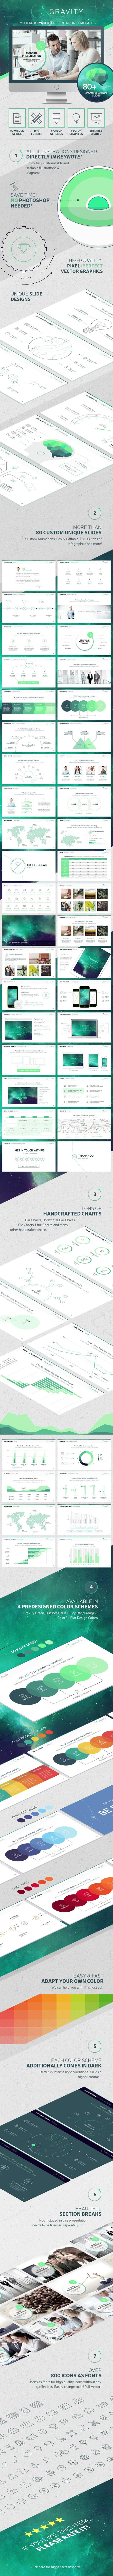 Gravity Keynote - Modern Presentation Template - Keynote Templates Presentation Templates